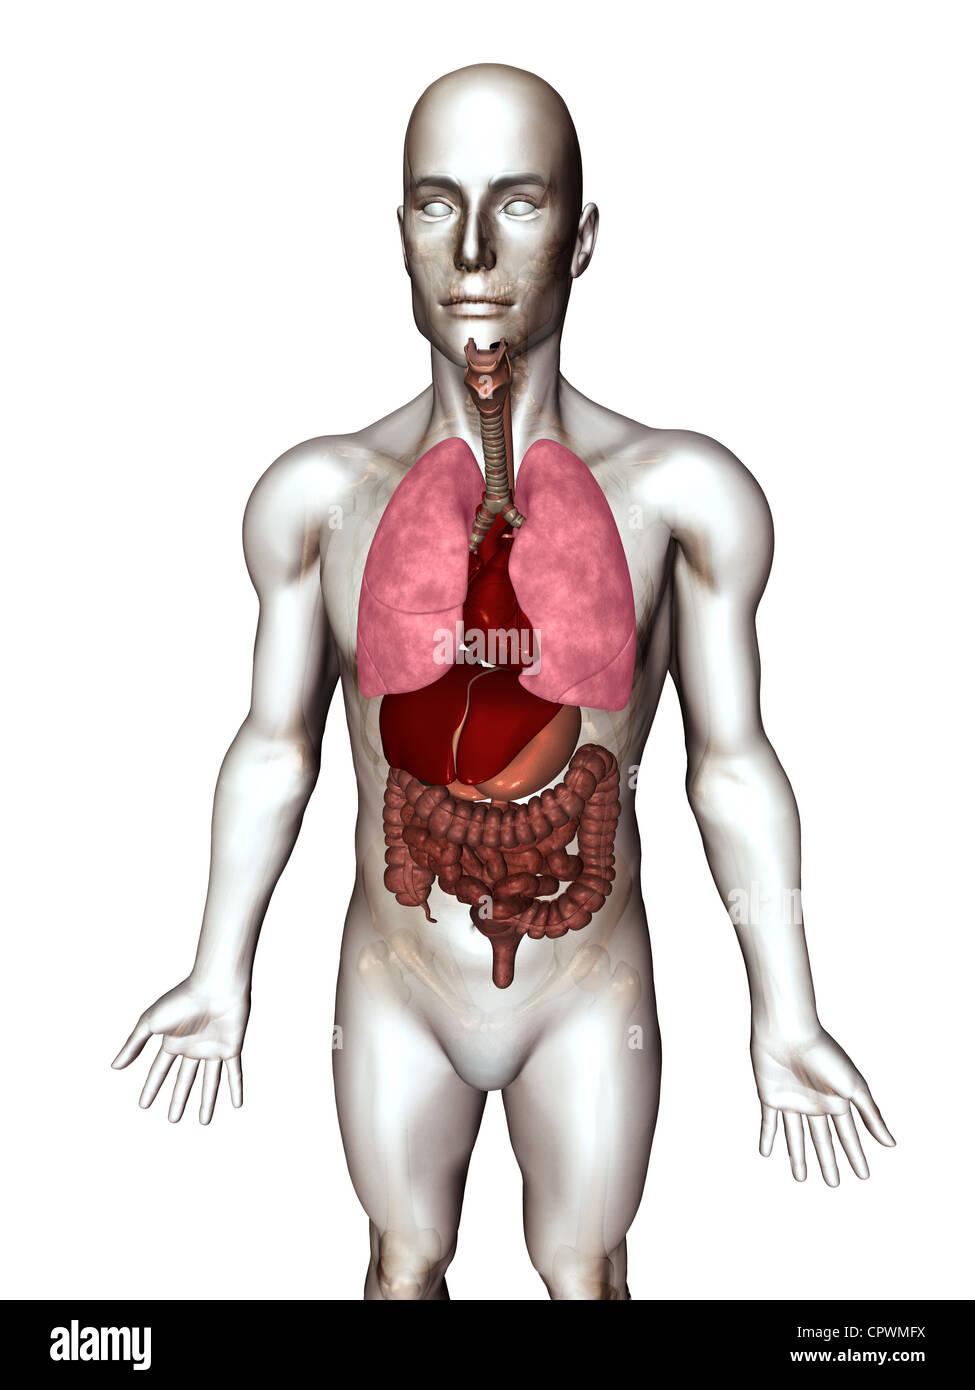 Anatomical Body Showing Organs Stock Photos & Anatomical Body ...